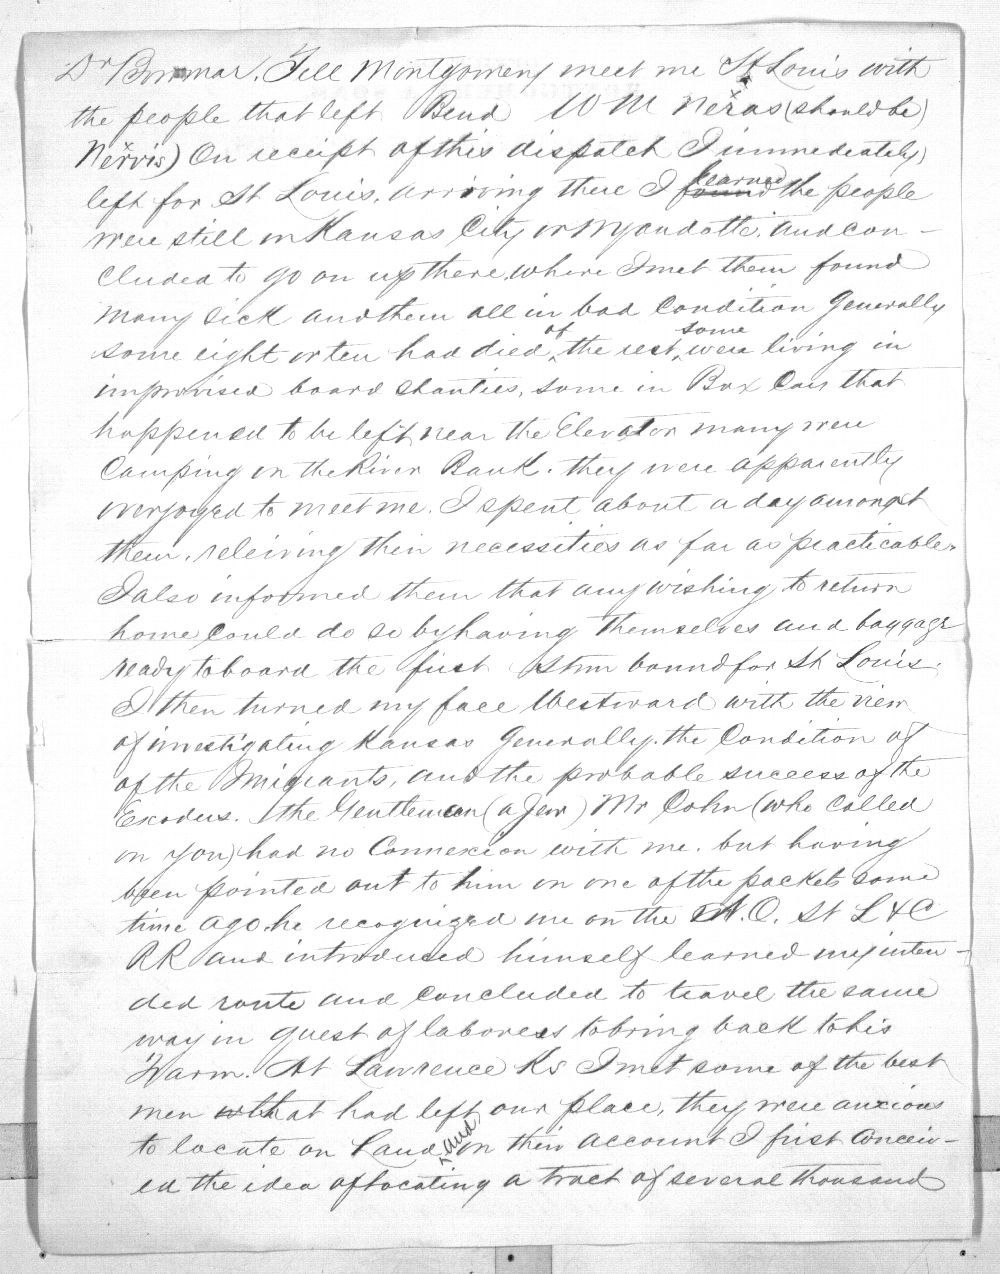 Isaiah T. Montgomery to Governor John P. St. John - 2